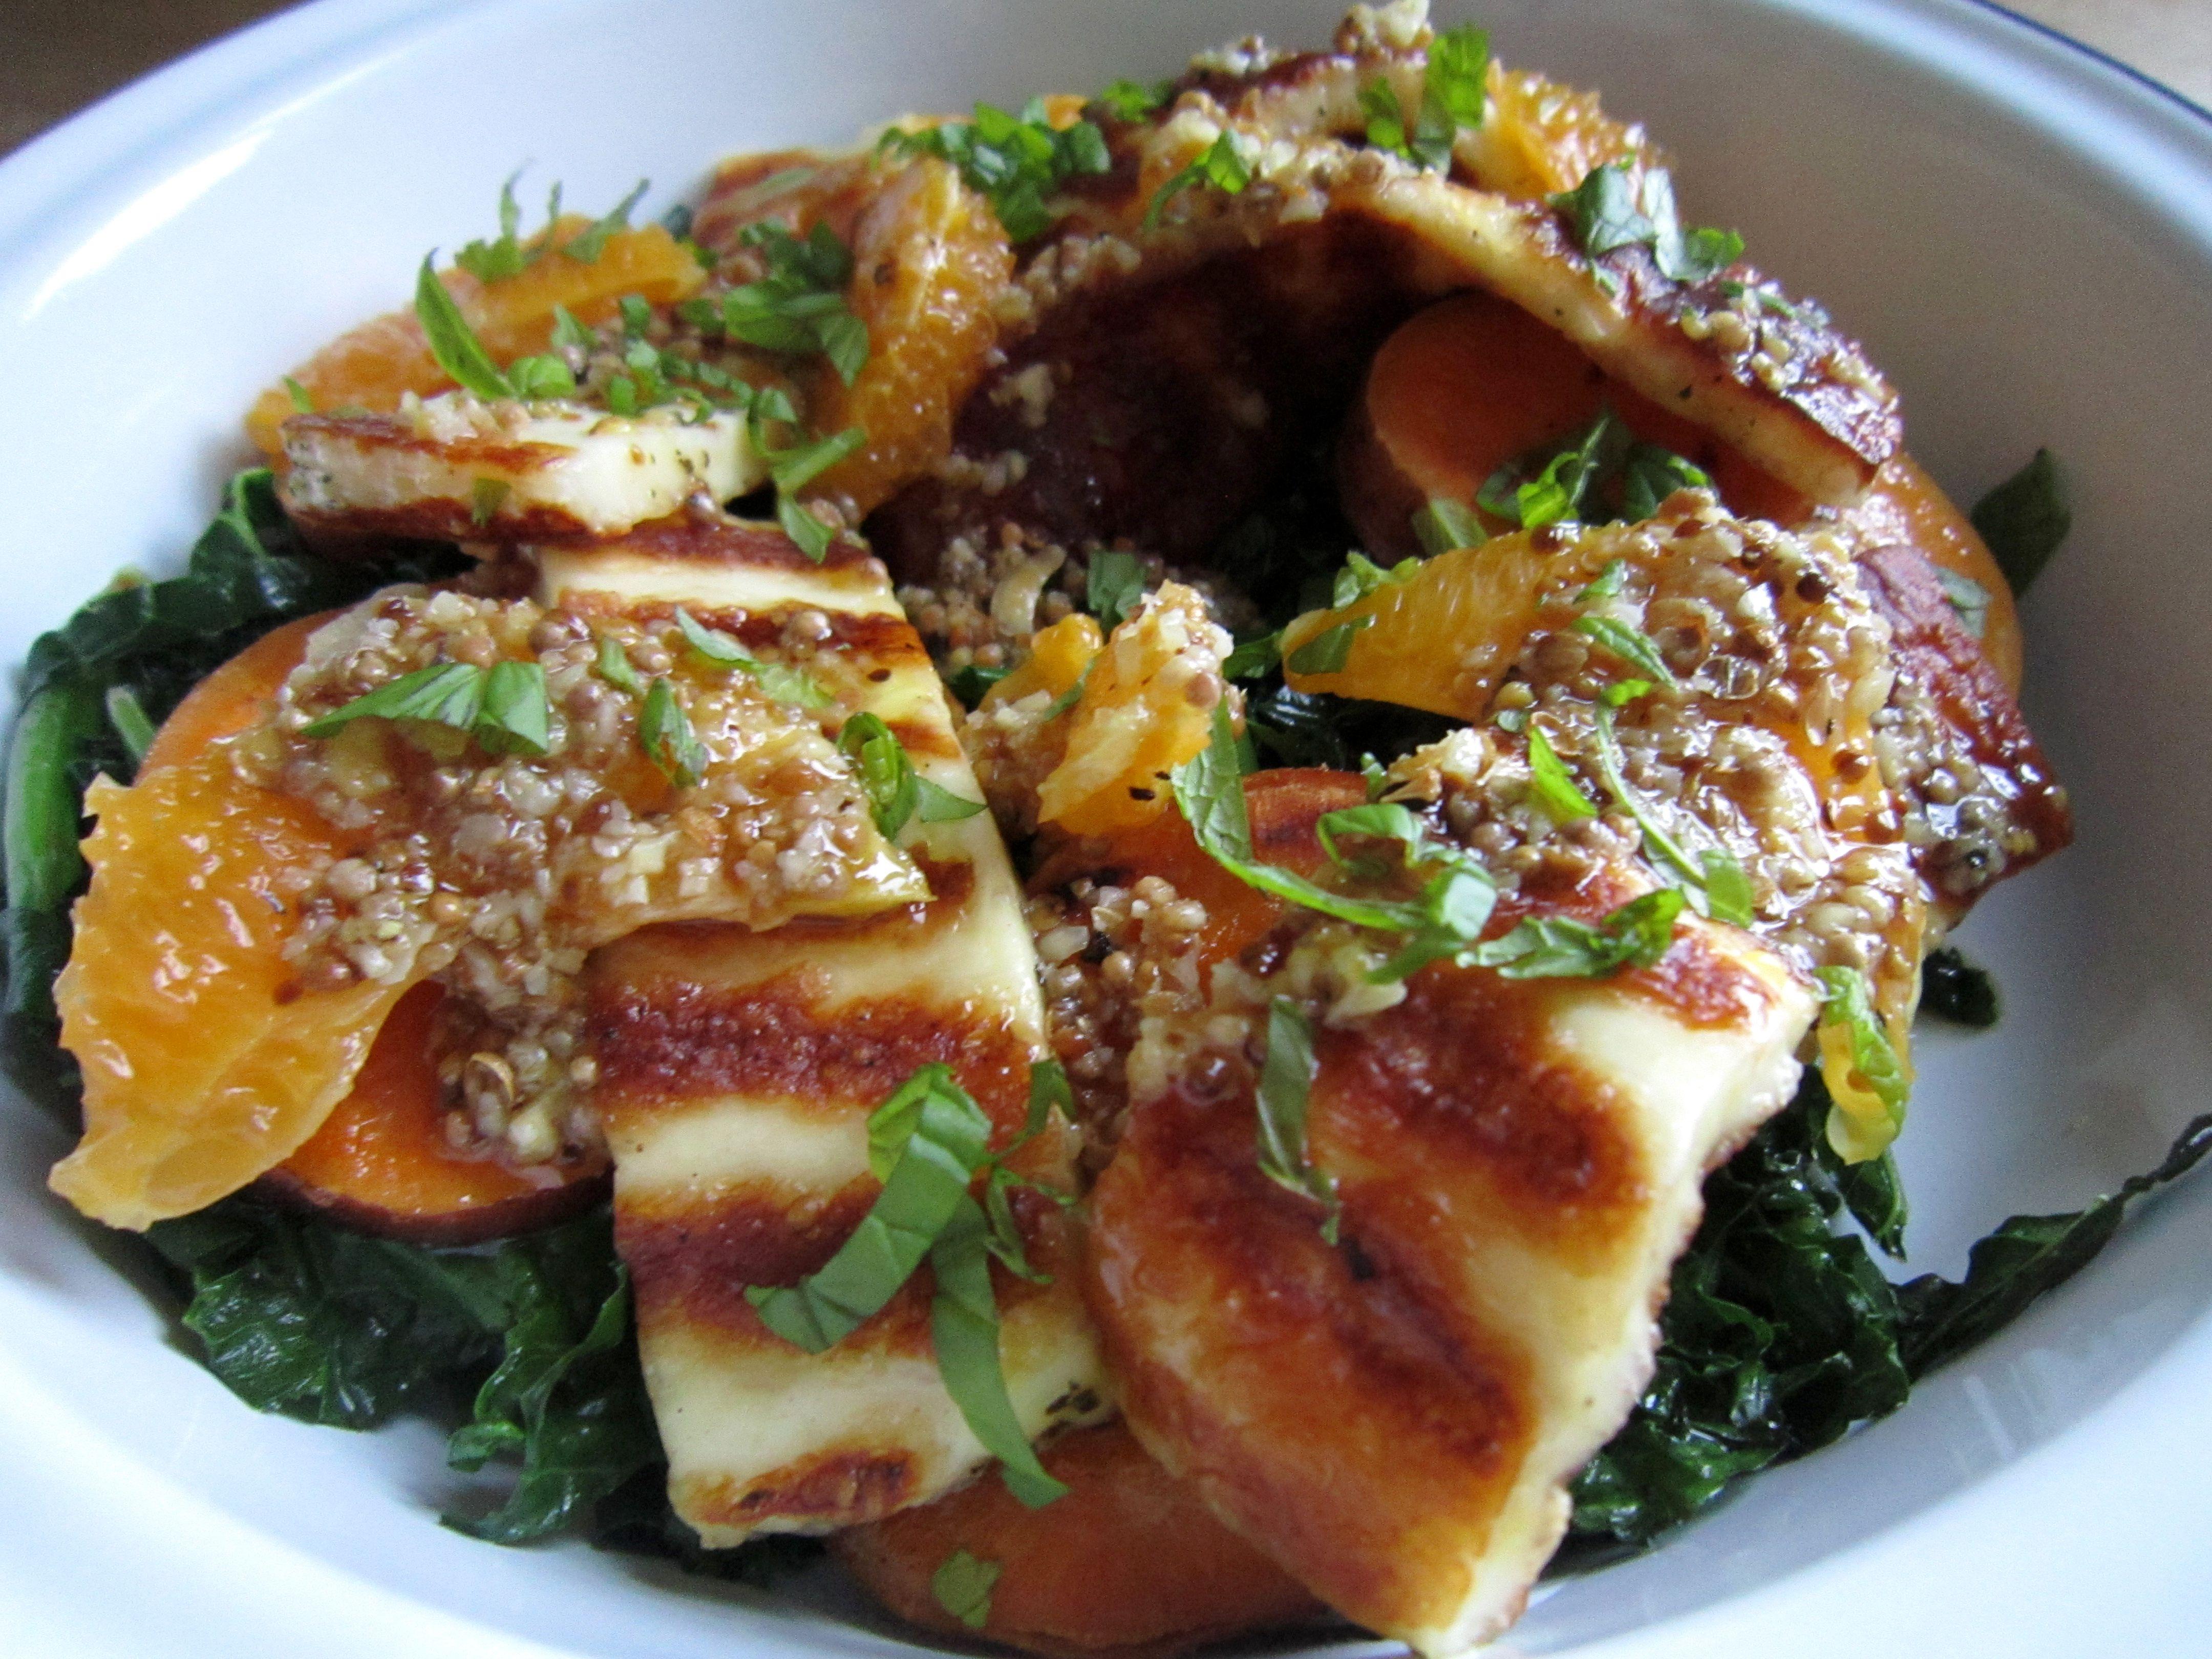 Halloumi, sweet potato and kale salad